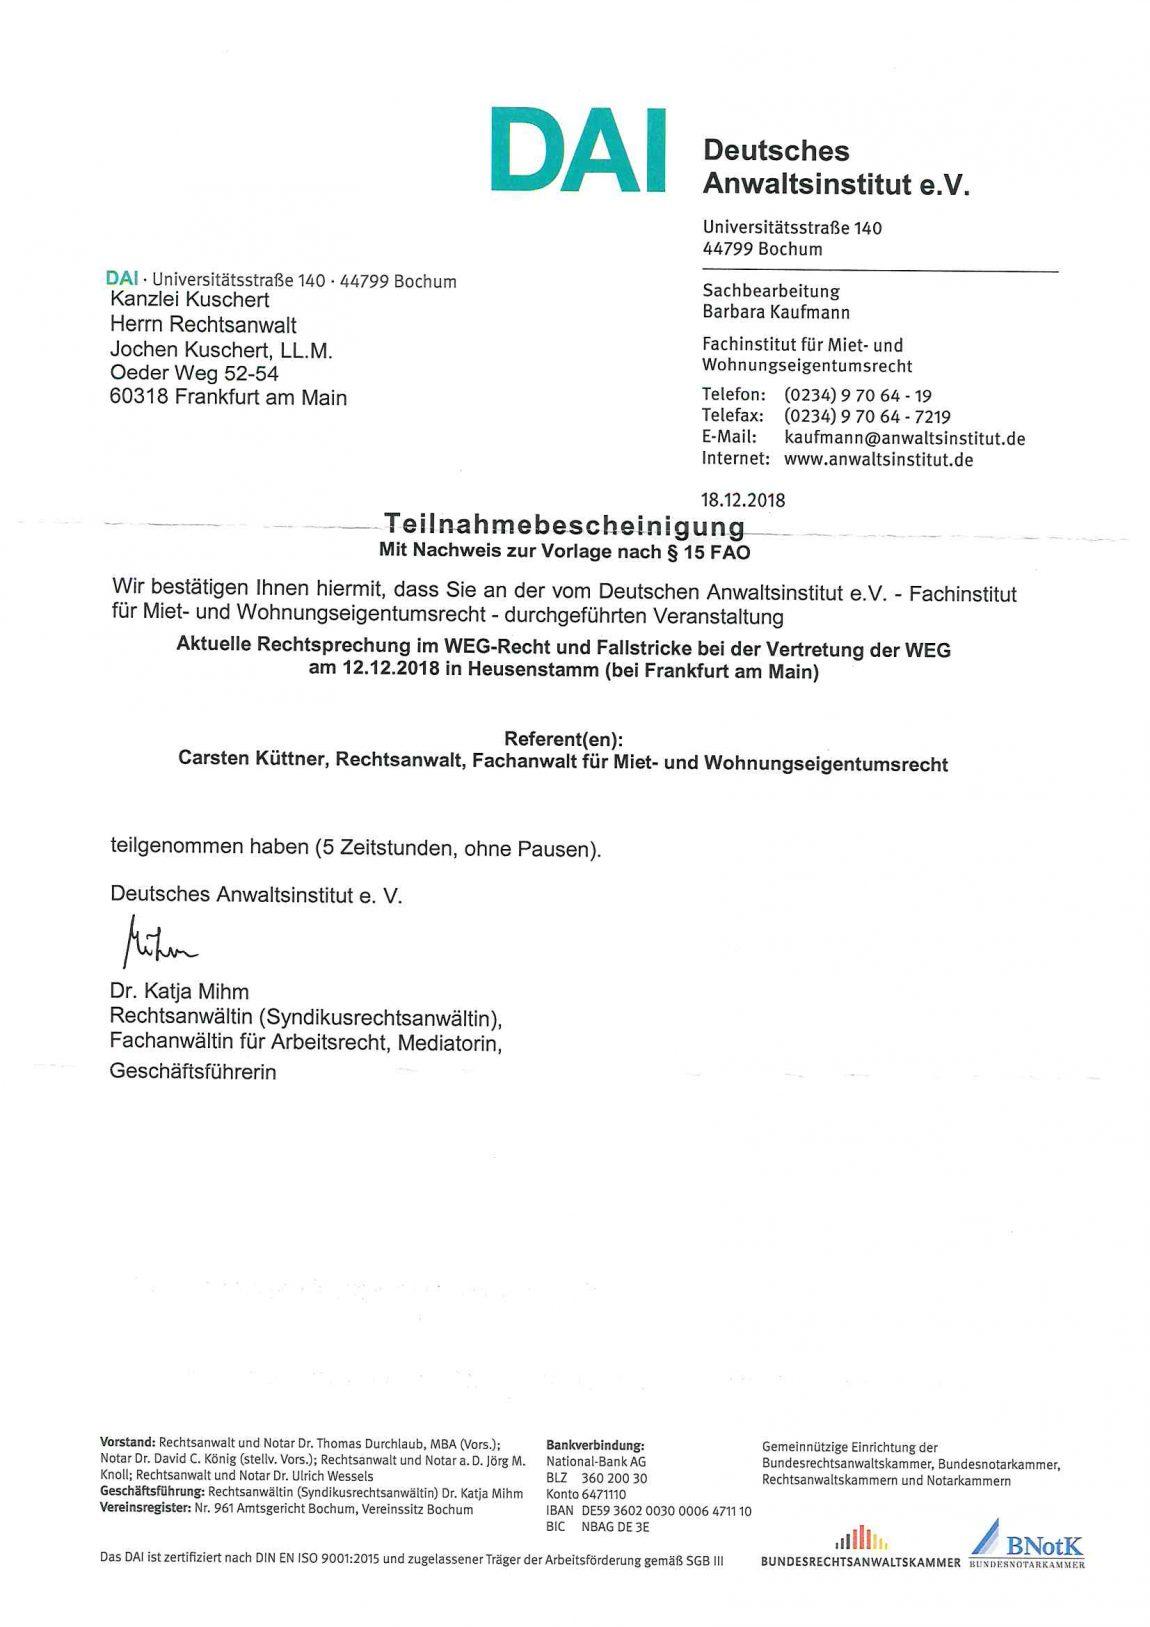 Aktuelle Rechtsprechung im WEG-Recht und Fallstricke bei der Vertretung der WEG